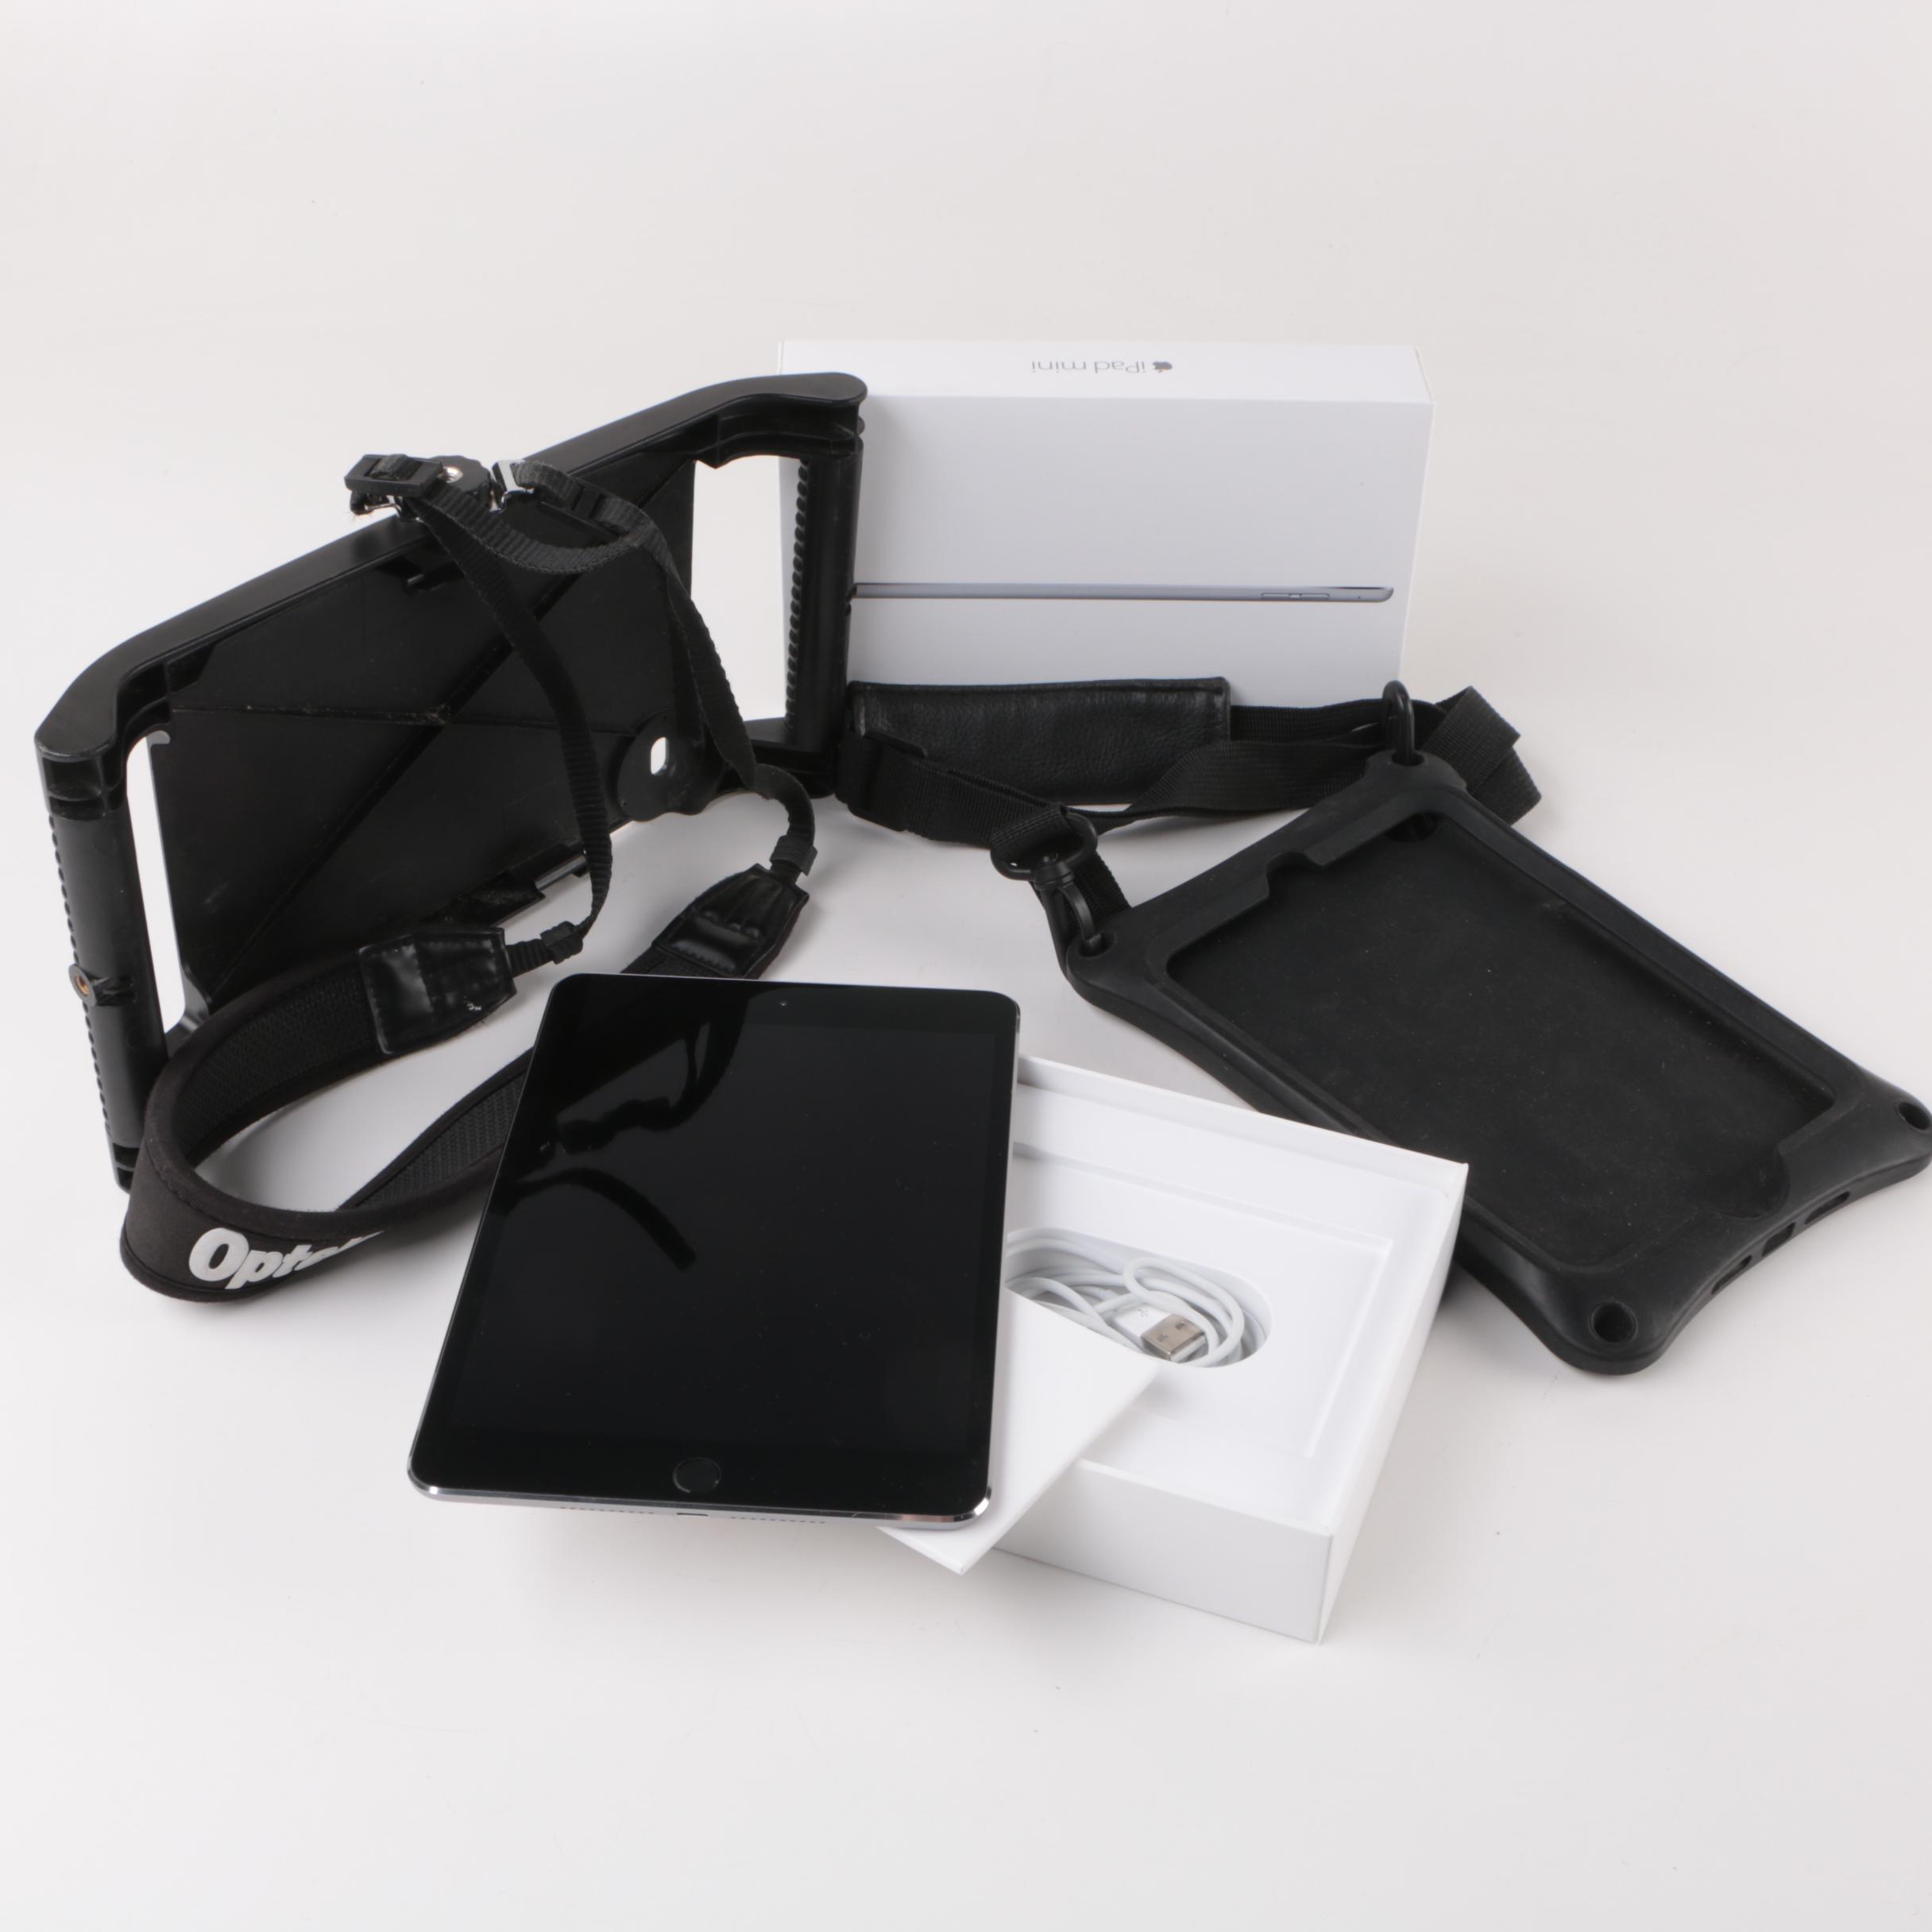 Apple iPad Mini and Accessories